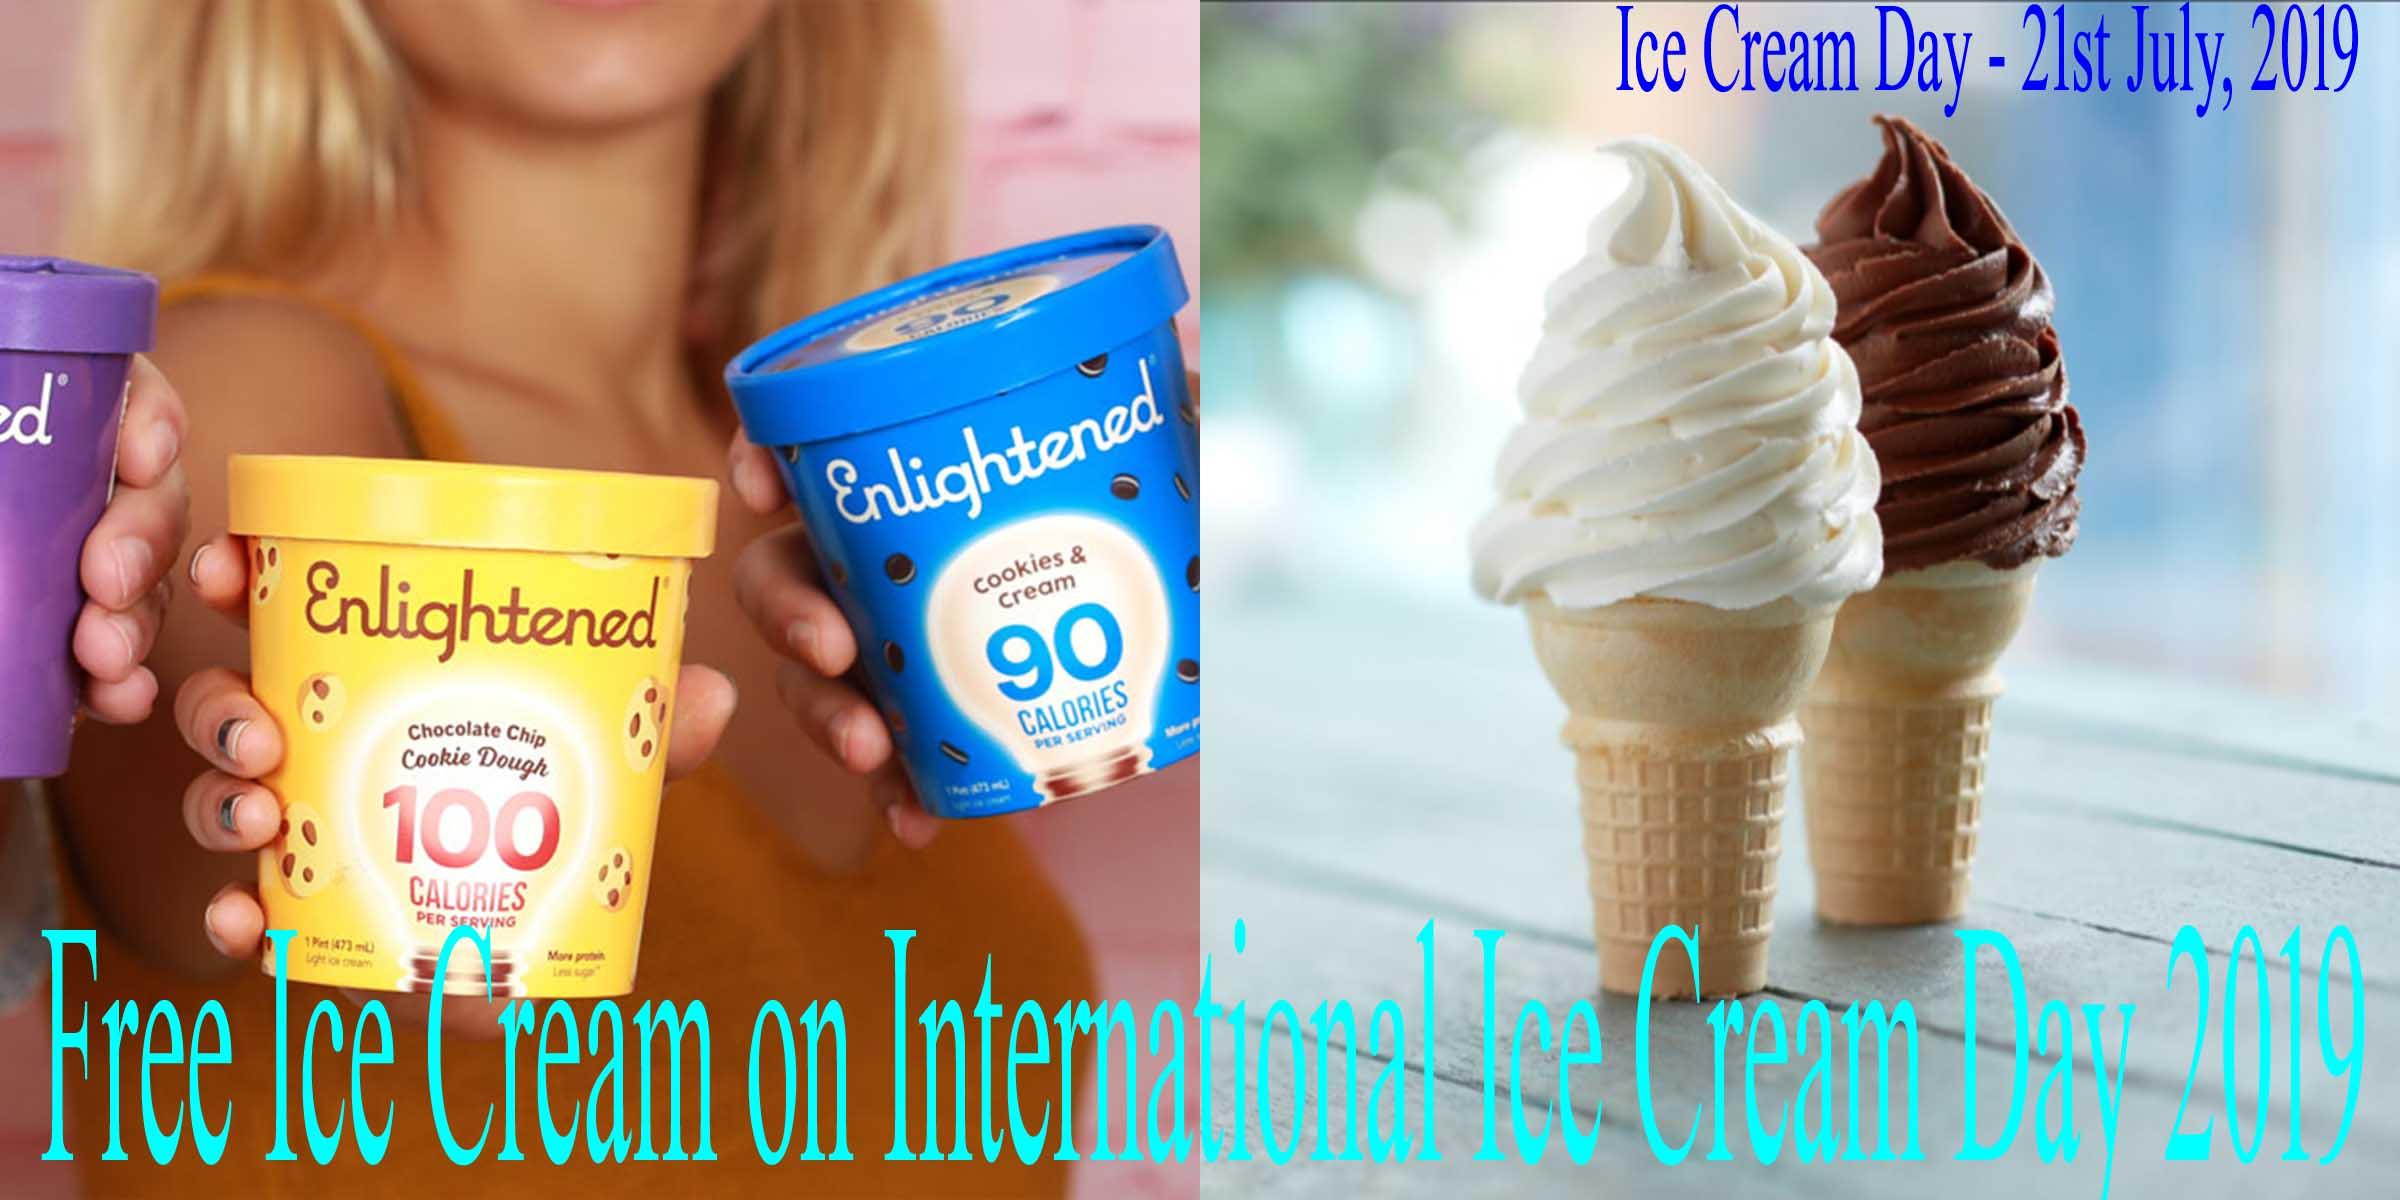 Free Ice Cream on International Ice Cream Day 2019